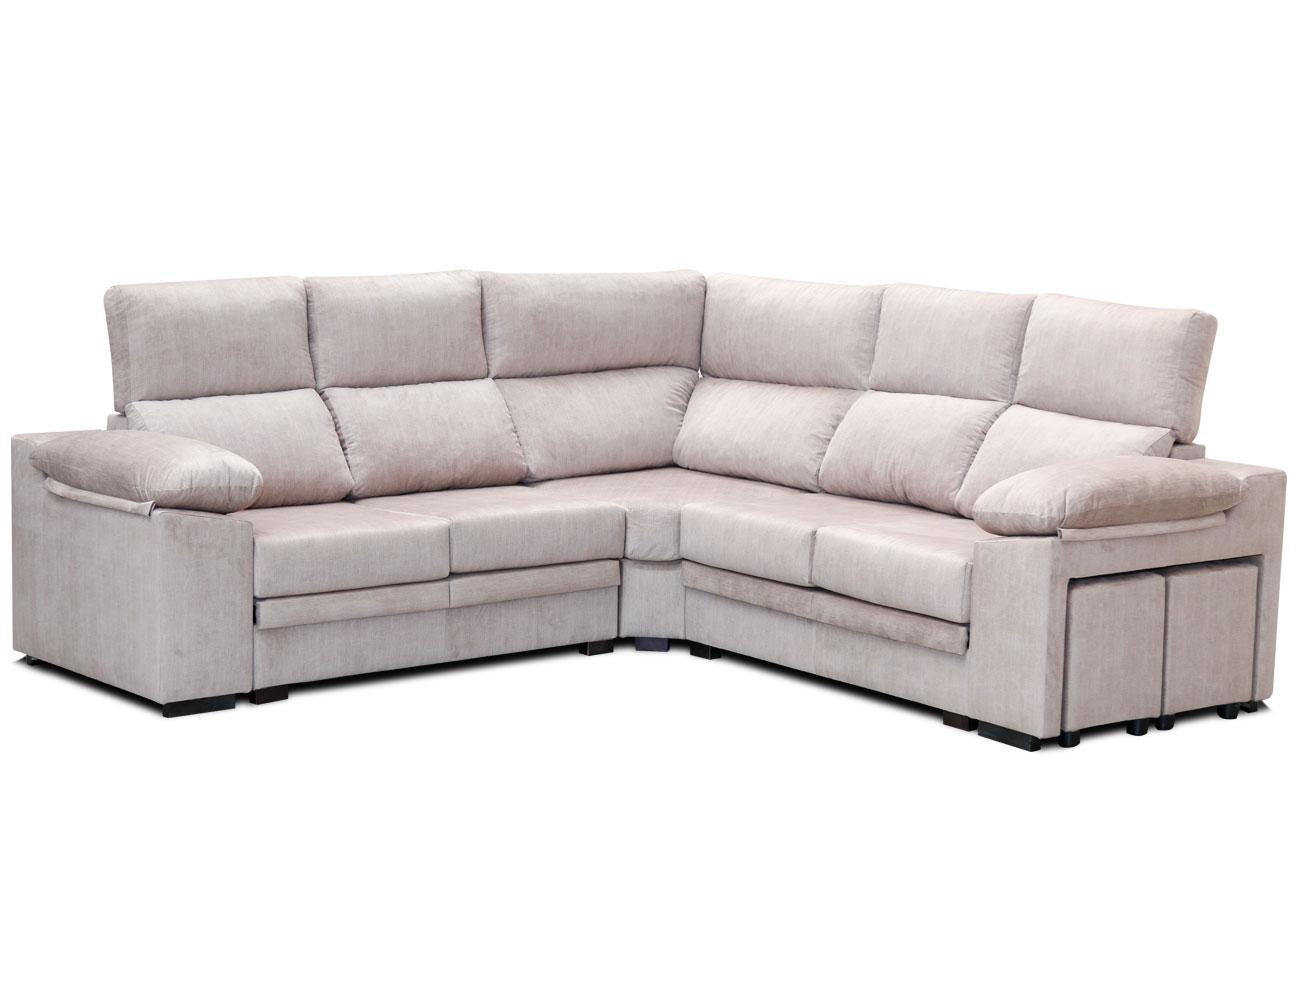 Sof rinconera con taburetes factory del mueble utrera - Factory del sofa sevilla ...